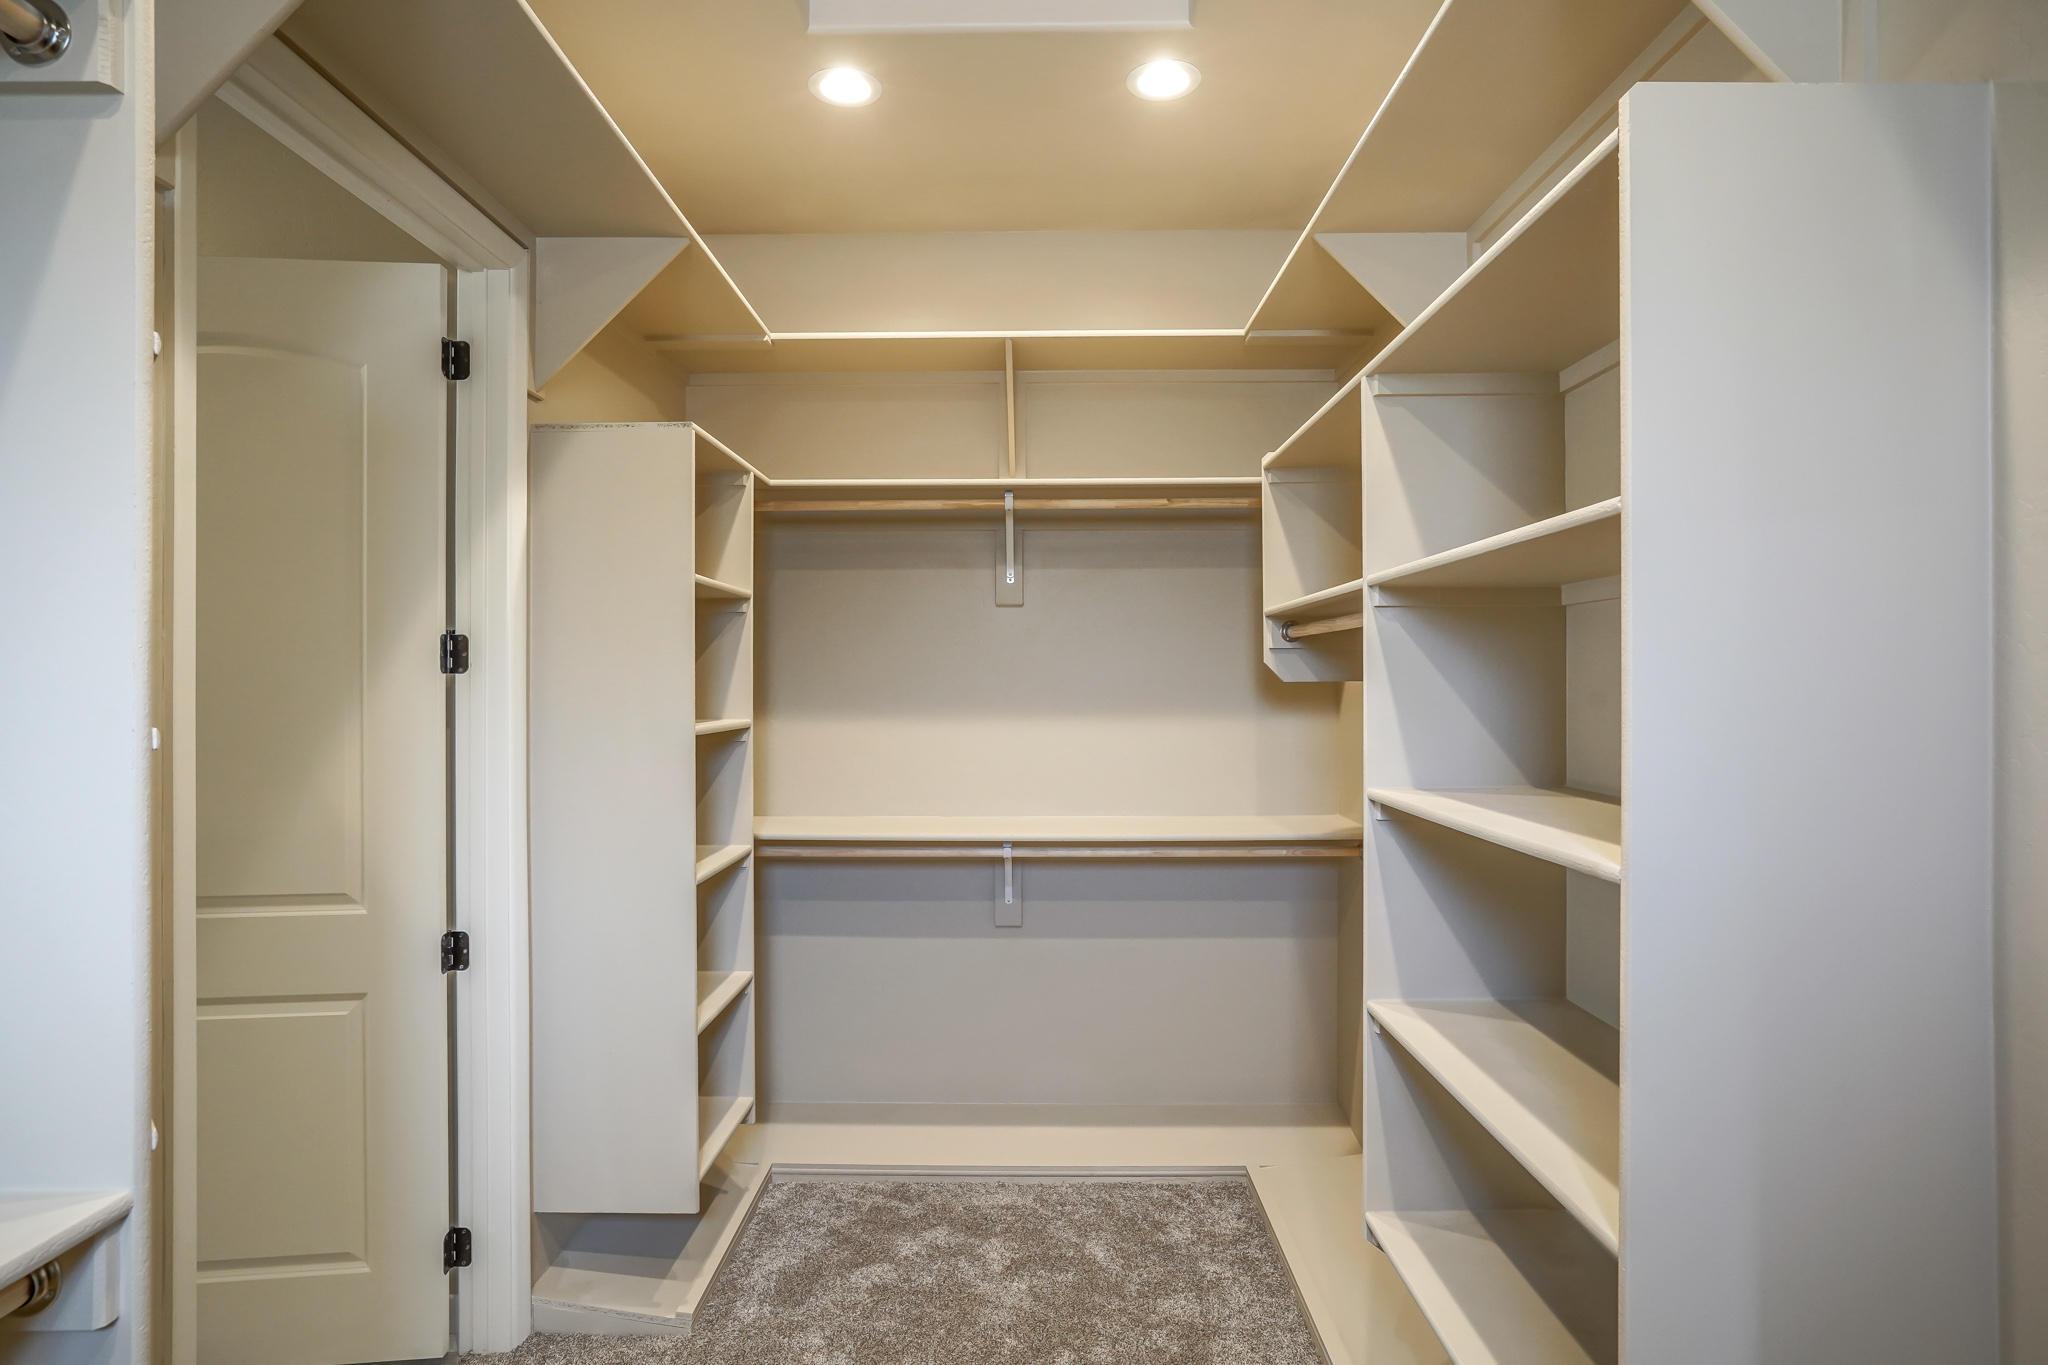 Master Closet with Custom Shelving